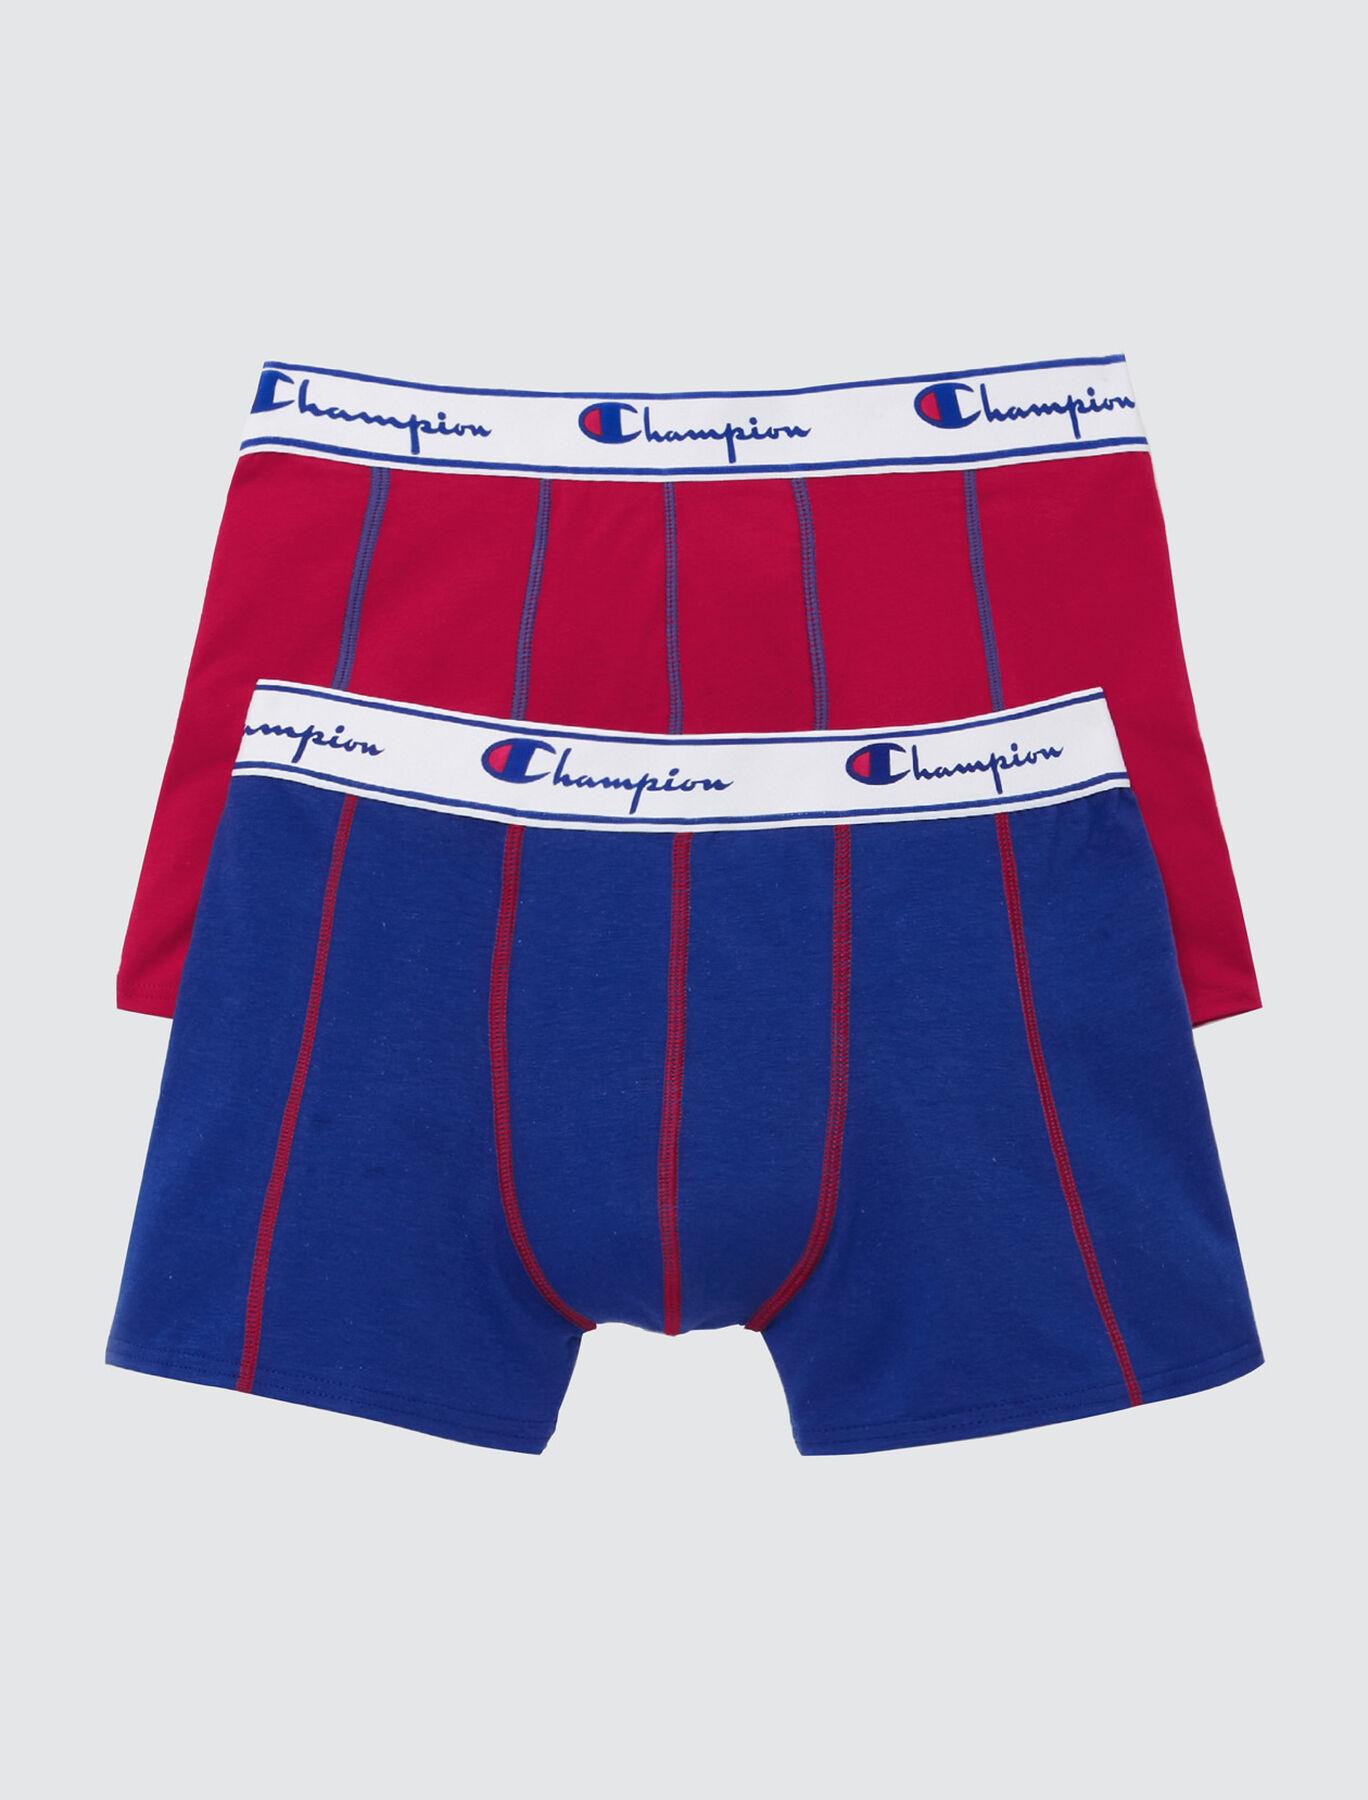 Boxers unis CHAMPION Lot*2